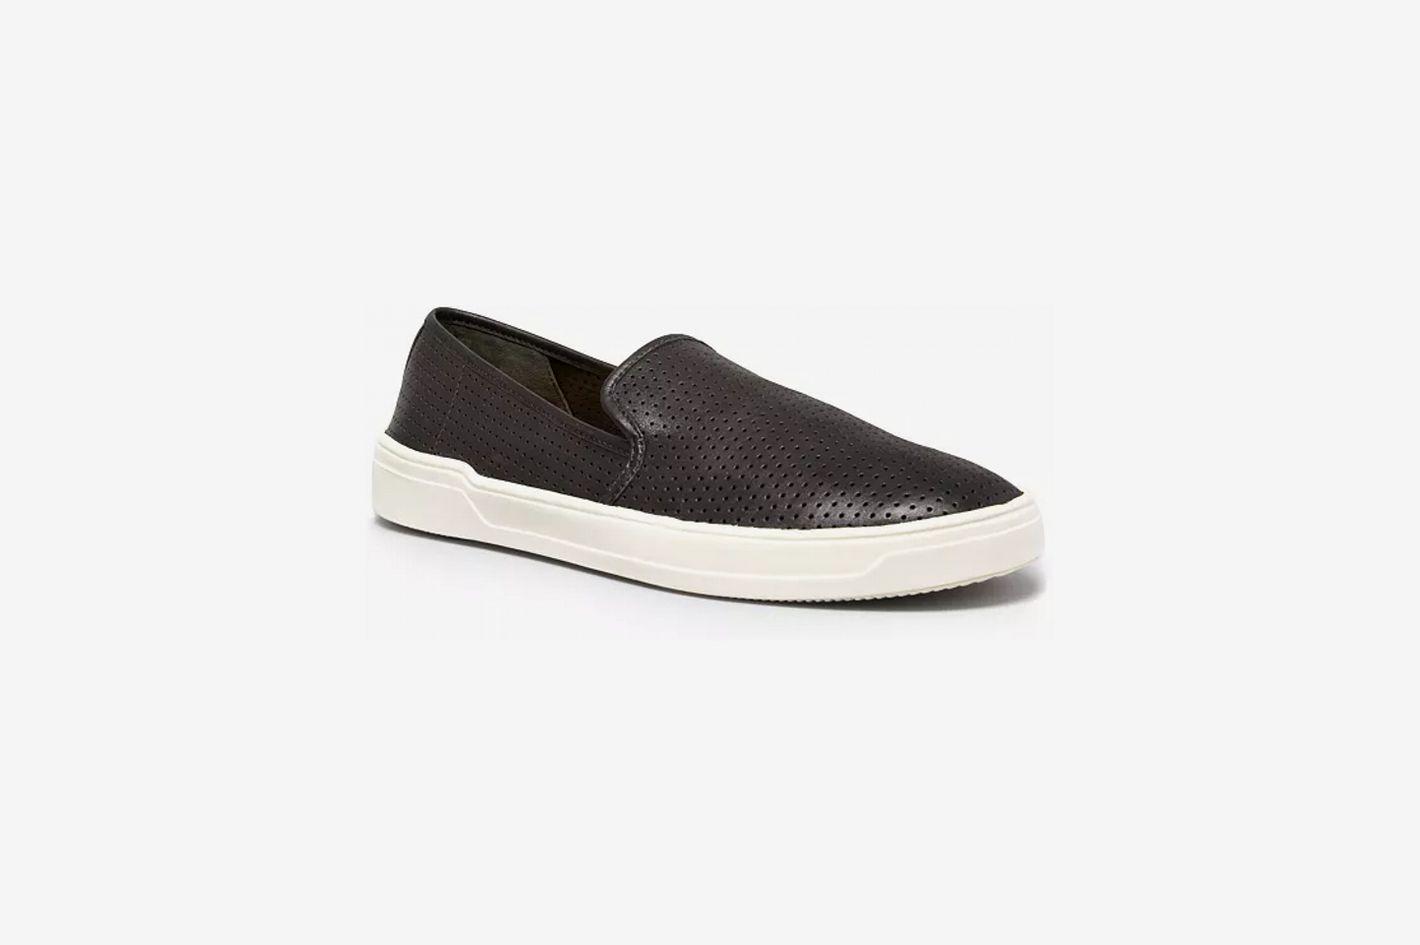 Via Spiga Women's Galeas Perforated Slip-On Sneakers